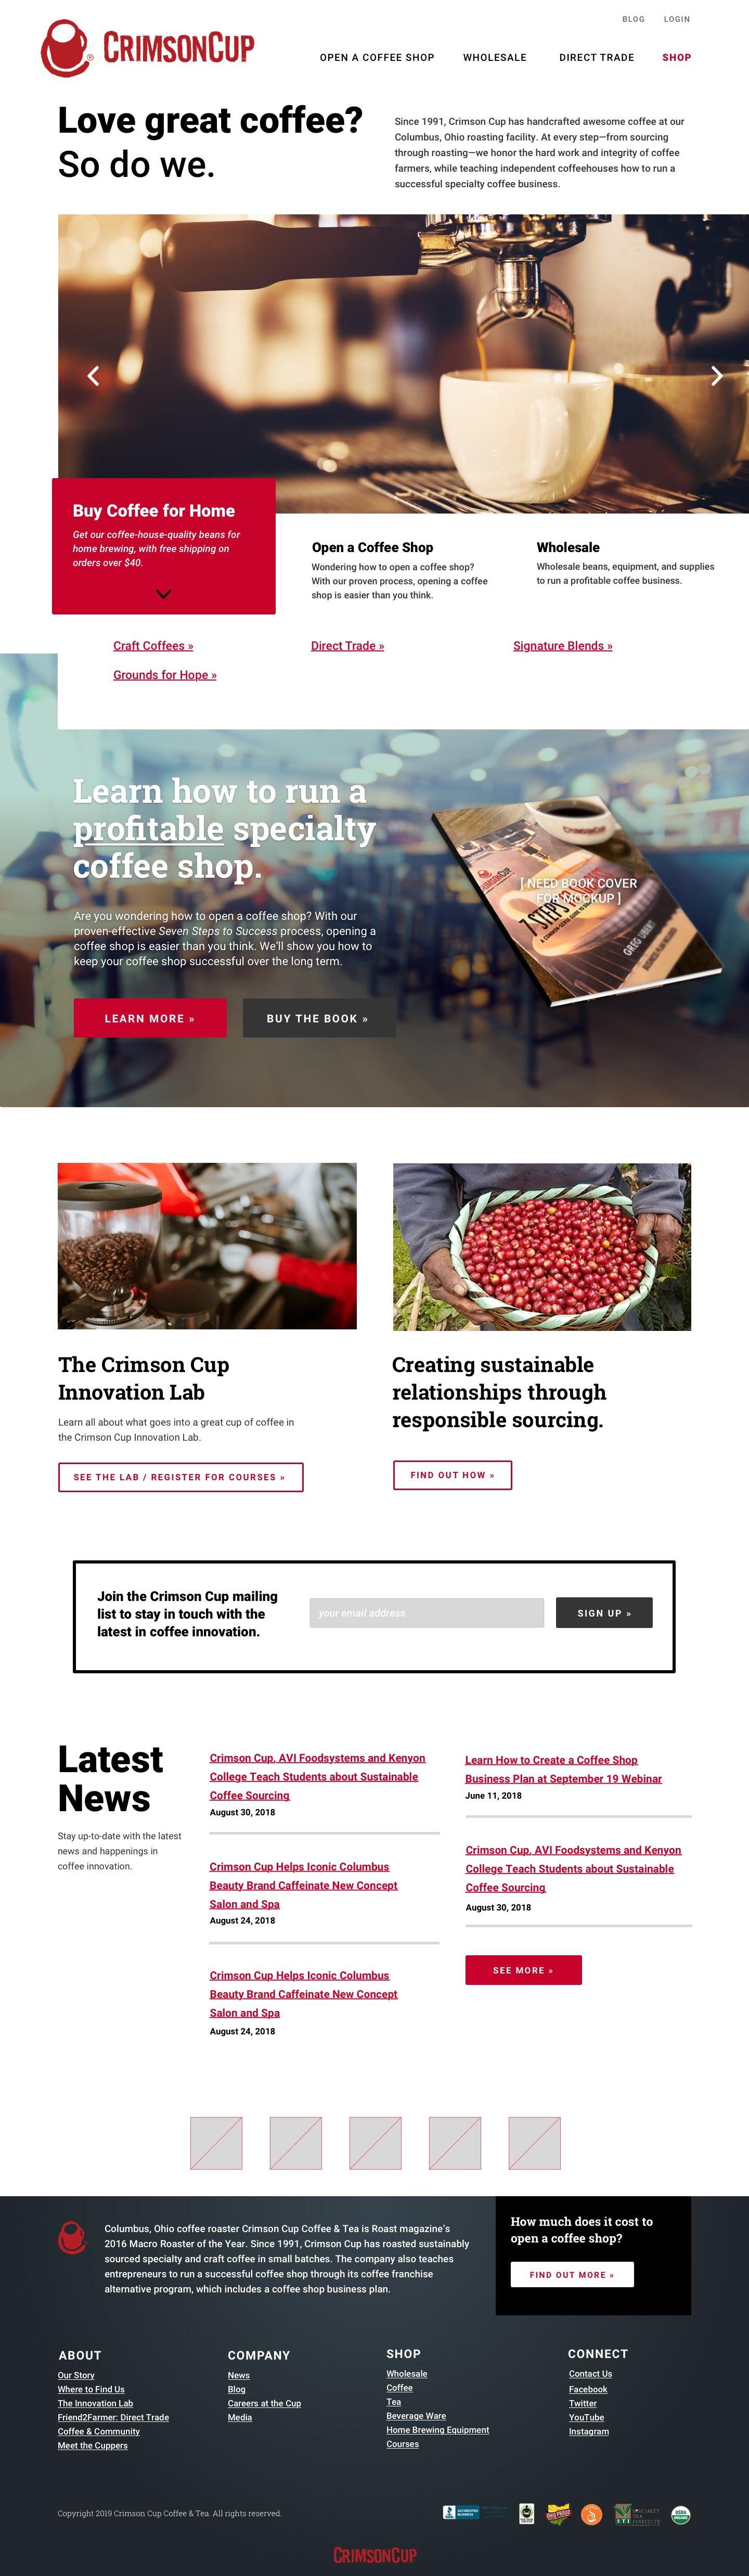 Crimson Cup - Home